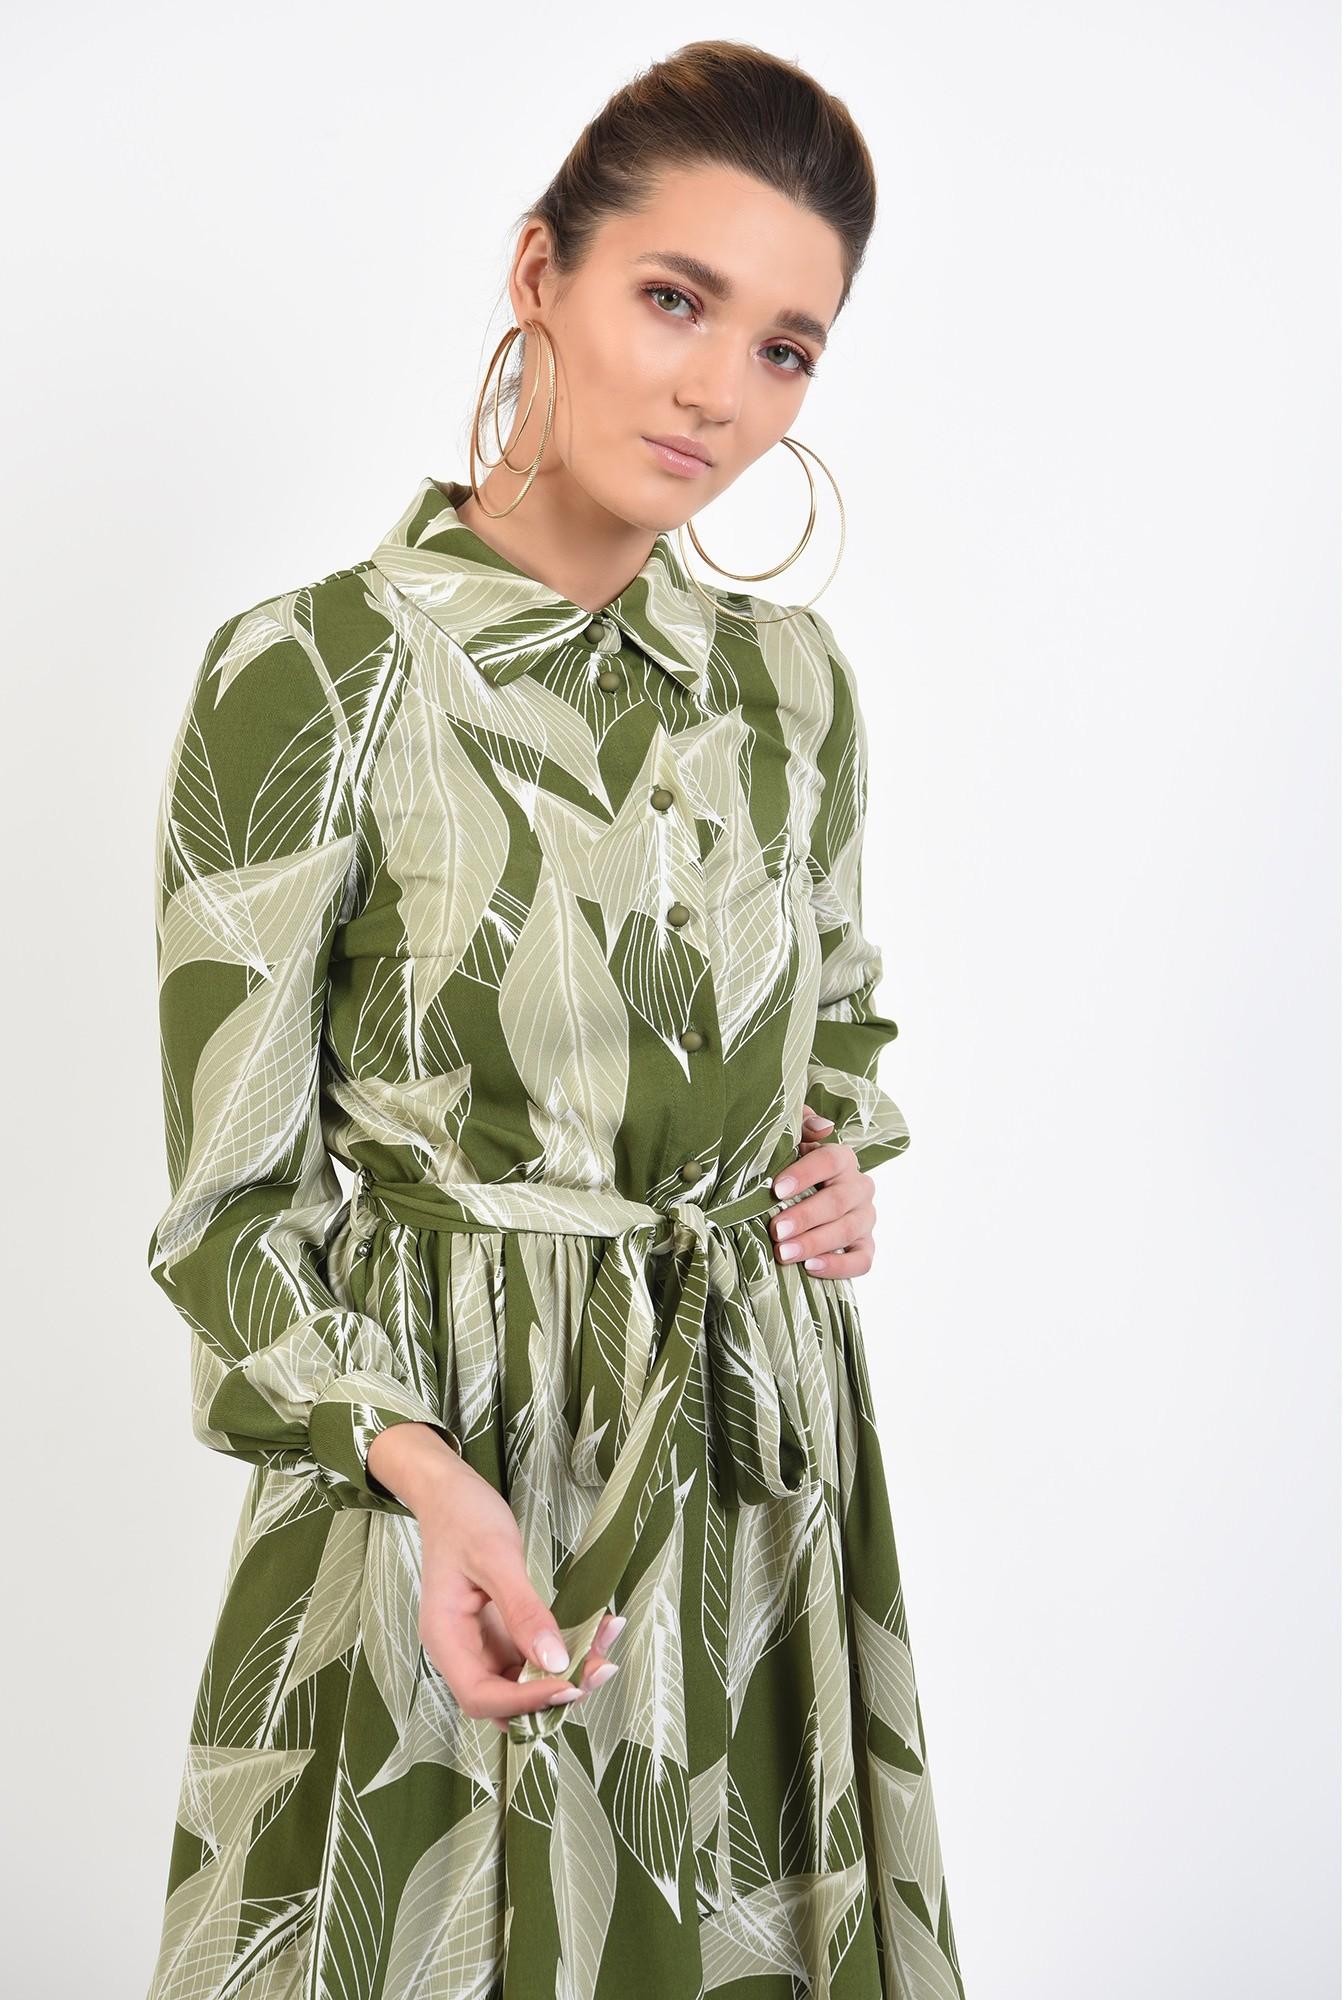 2 - 360 - rochie mini, cu print botanic, maneci lungi, nasturi, cordon